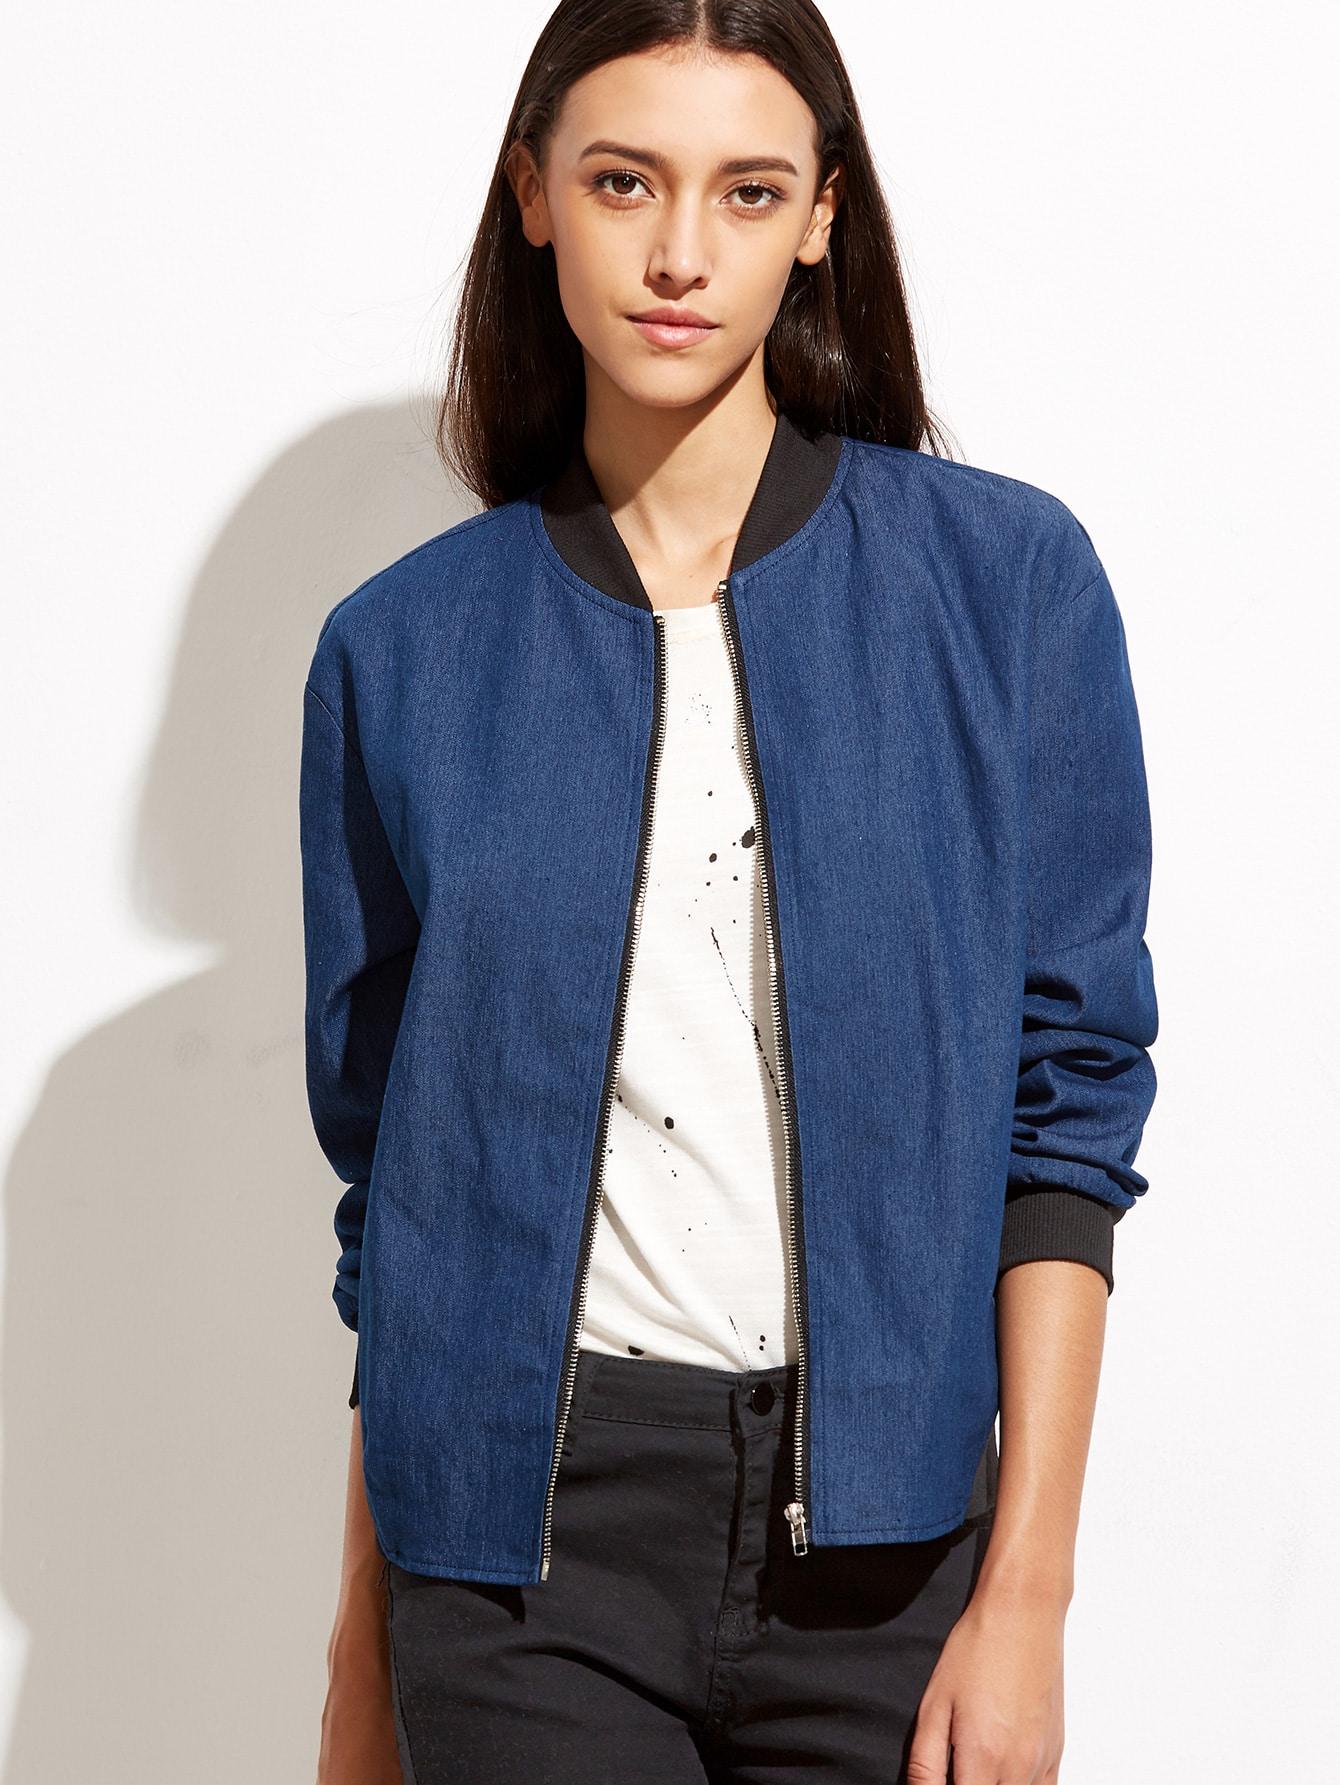 Blue Ribbed Trim Zip Up Chambray Bomber Jacket jacket160922703